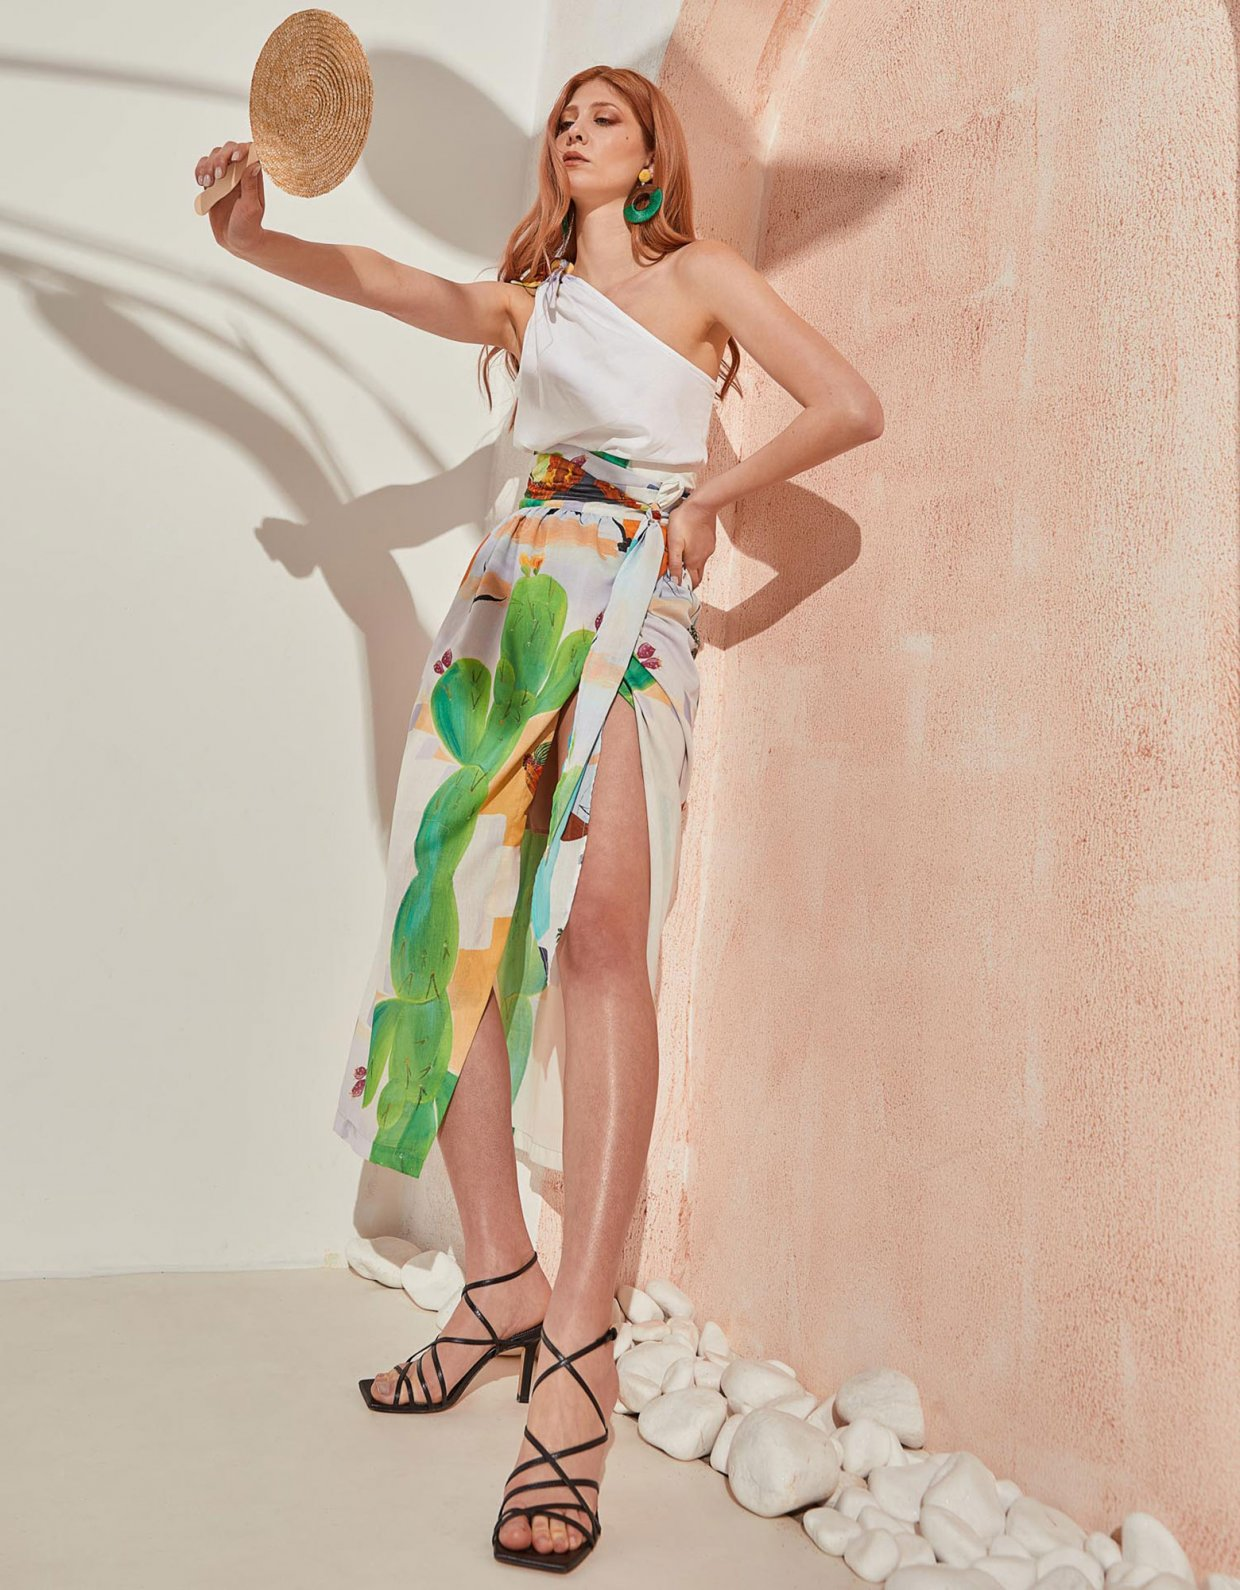 The Knl's Column skirt cactus print